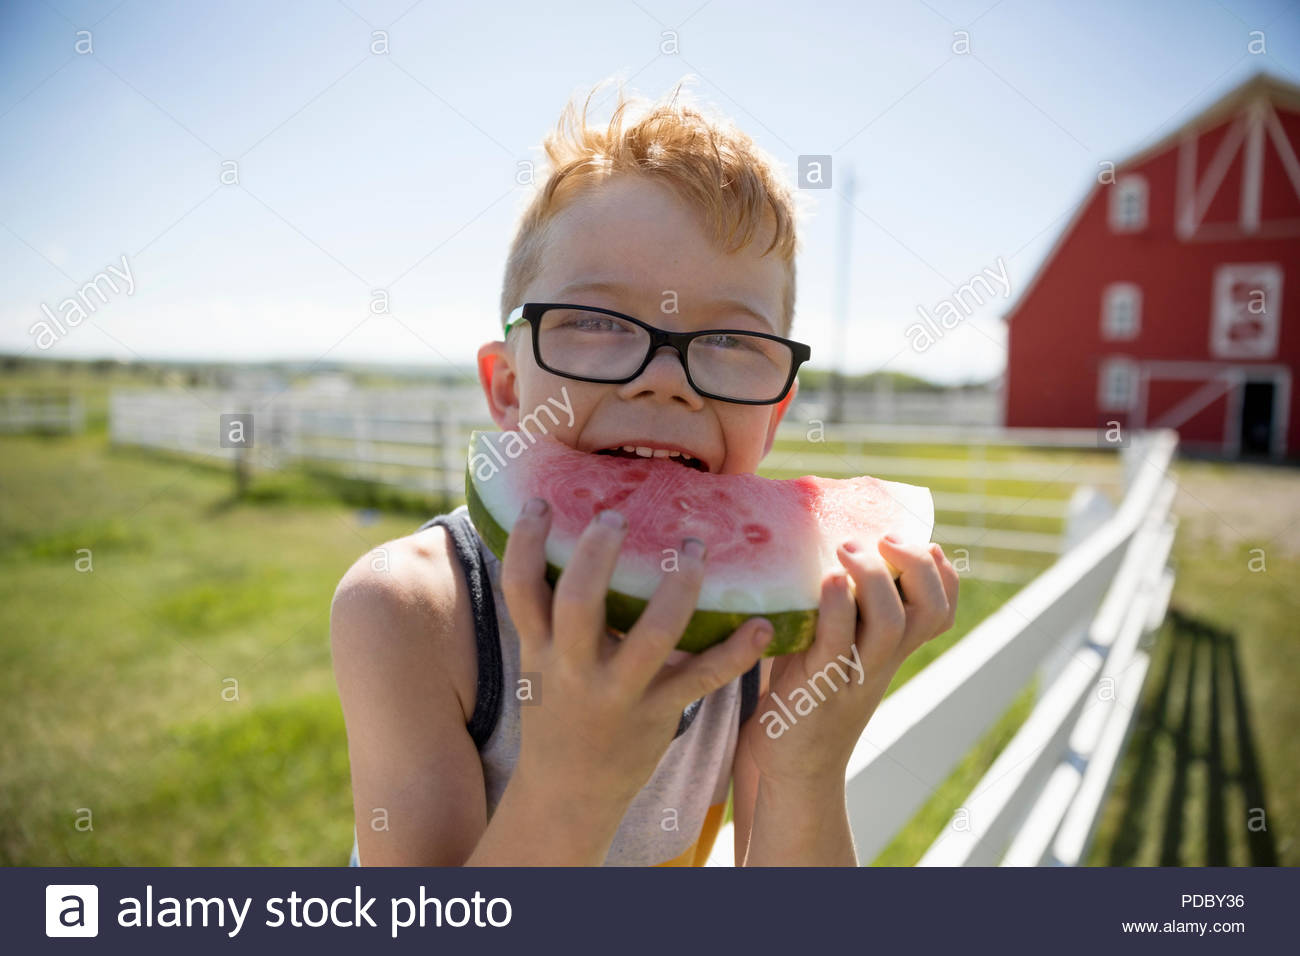 Portrait cute boy eating watermelon on sunny rural farm fence - Stock Image